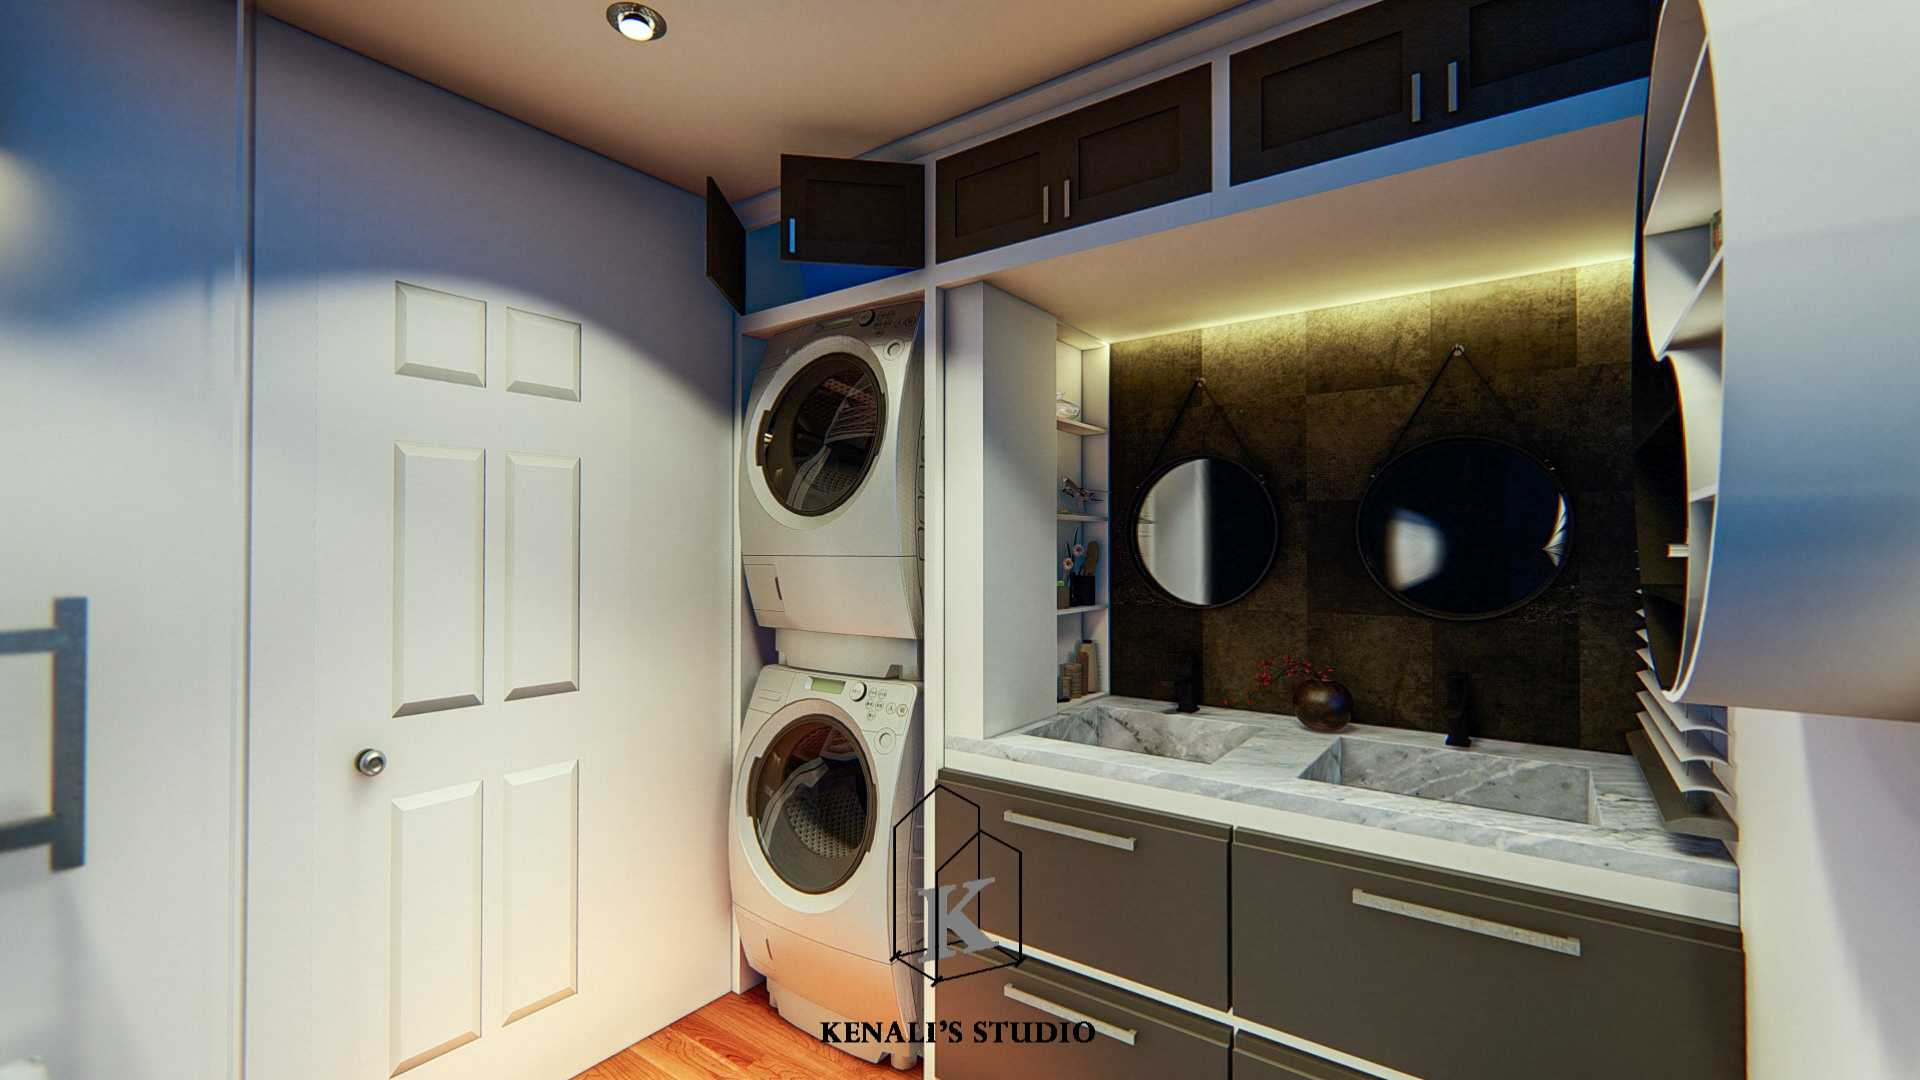 Kenali's Studio Project : Laundry & Bathroom Amerika Serikat Amerika Serikat Kenalis-Studio-Project-Laundry-Bathroom  72916